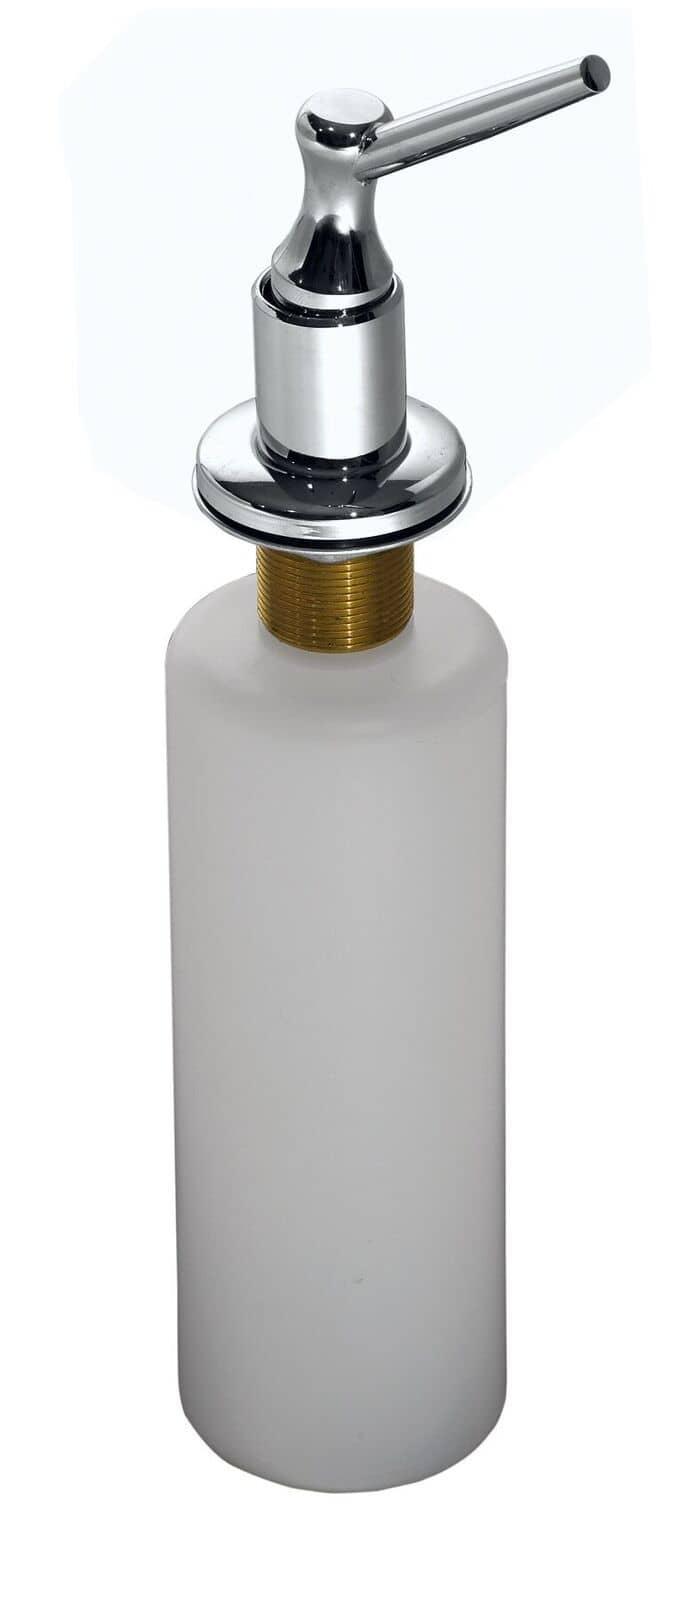 Metal Dispenser Soap Dish Toothbrush Holder Bathroom: Krowne Metal H-101 Krowne Soap Dispenser